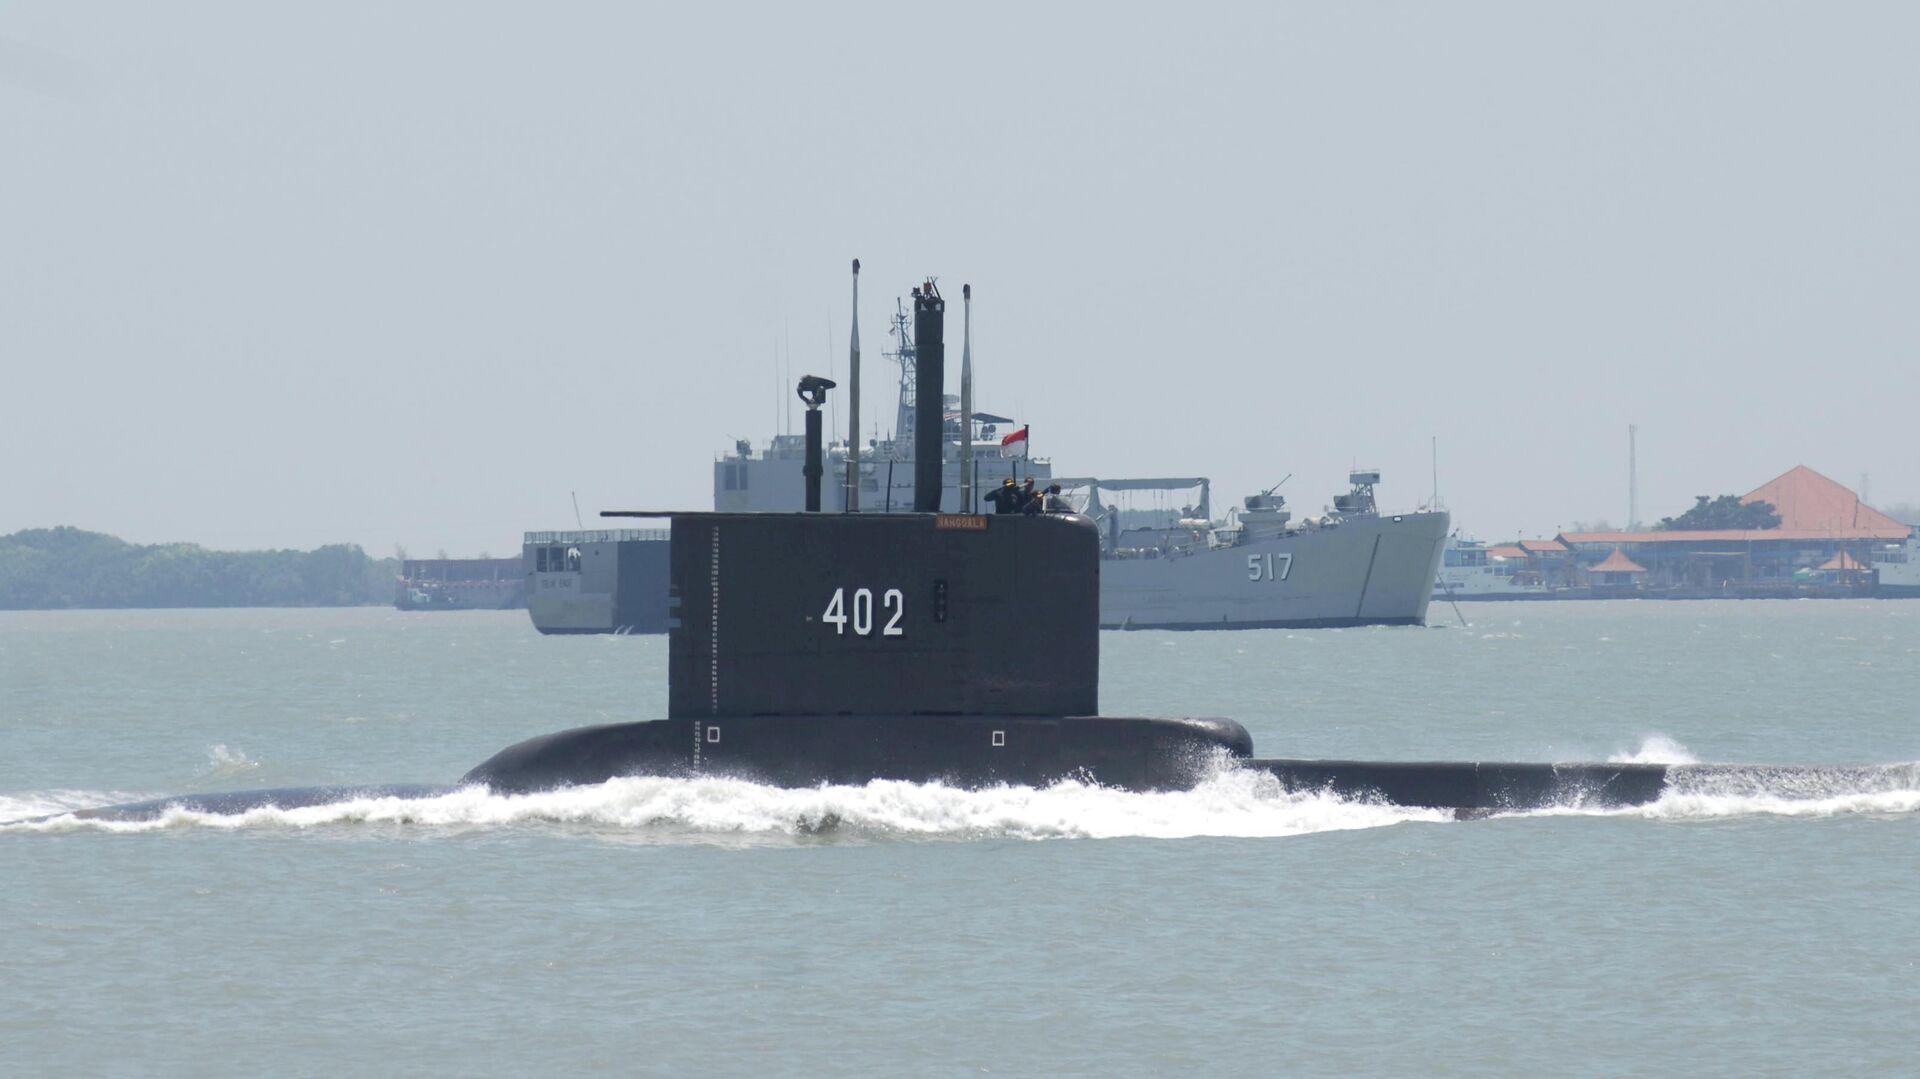 Submarino indonesio desaparecido - Sputnik Mundo, 1920, 22.04.2021